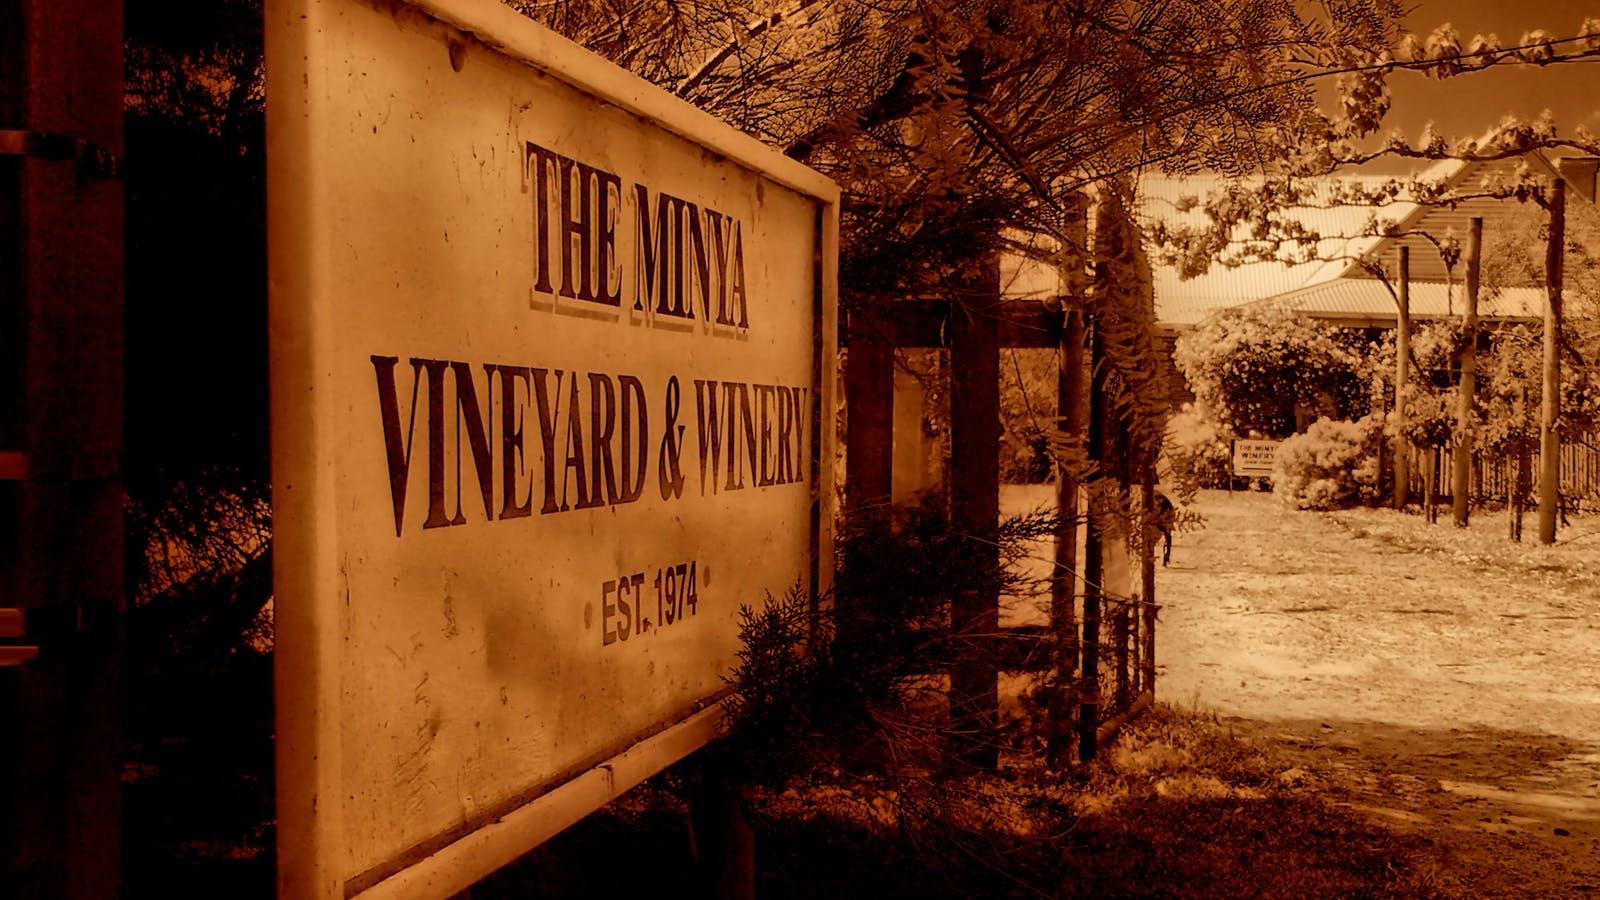 The Minya Vineyard & Winery